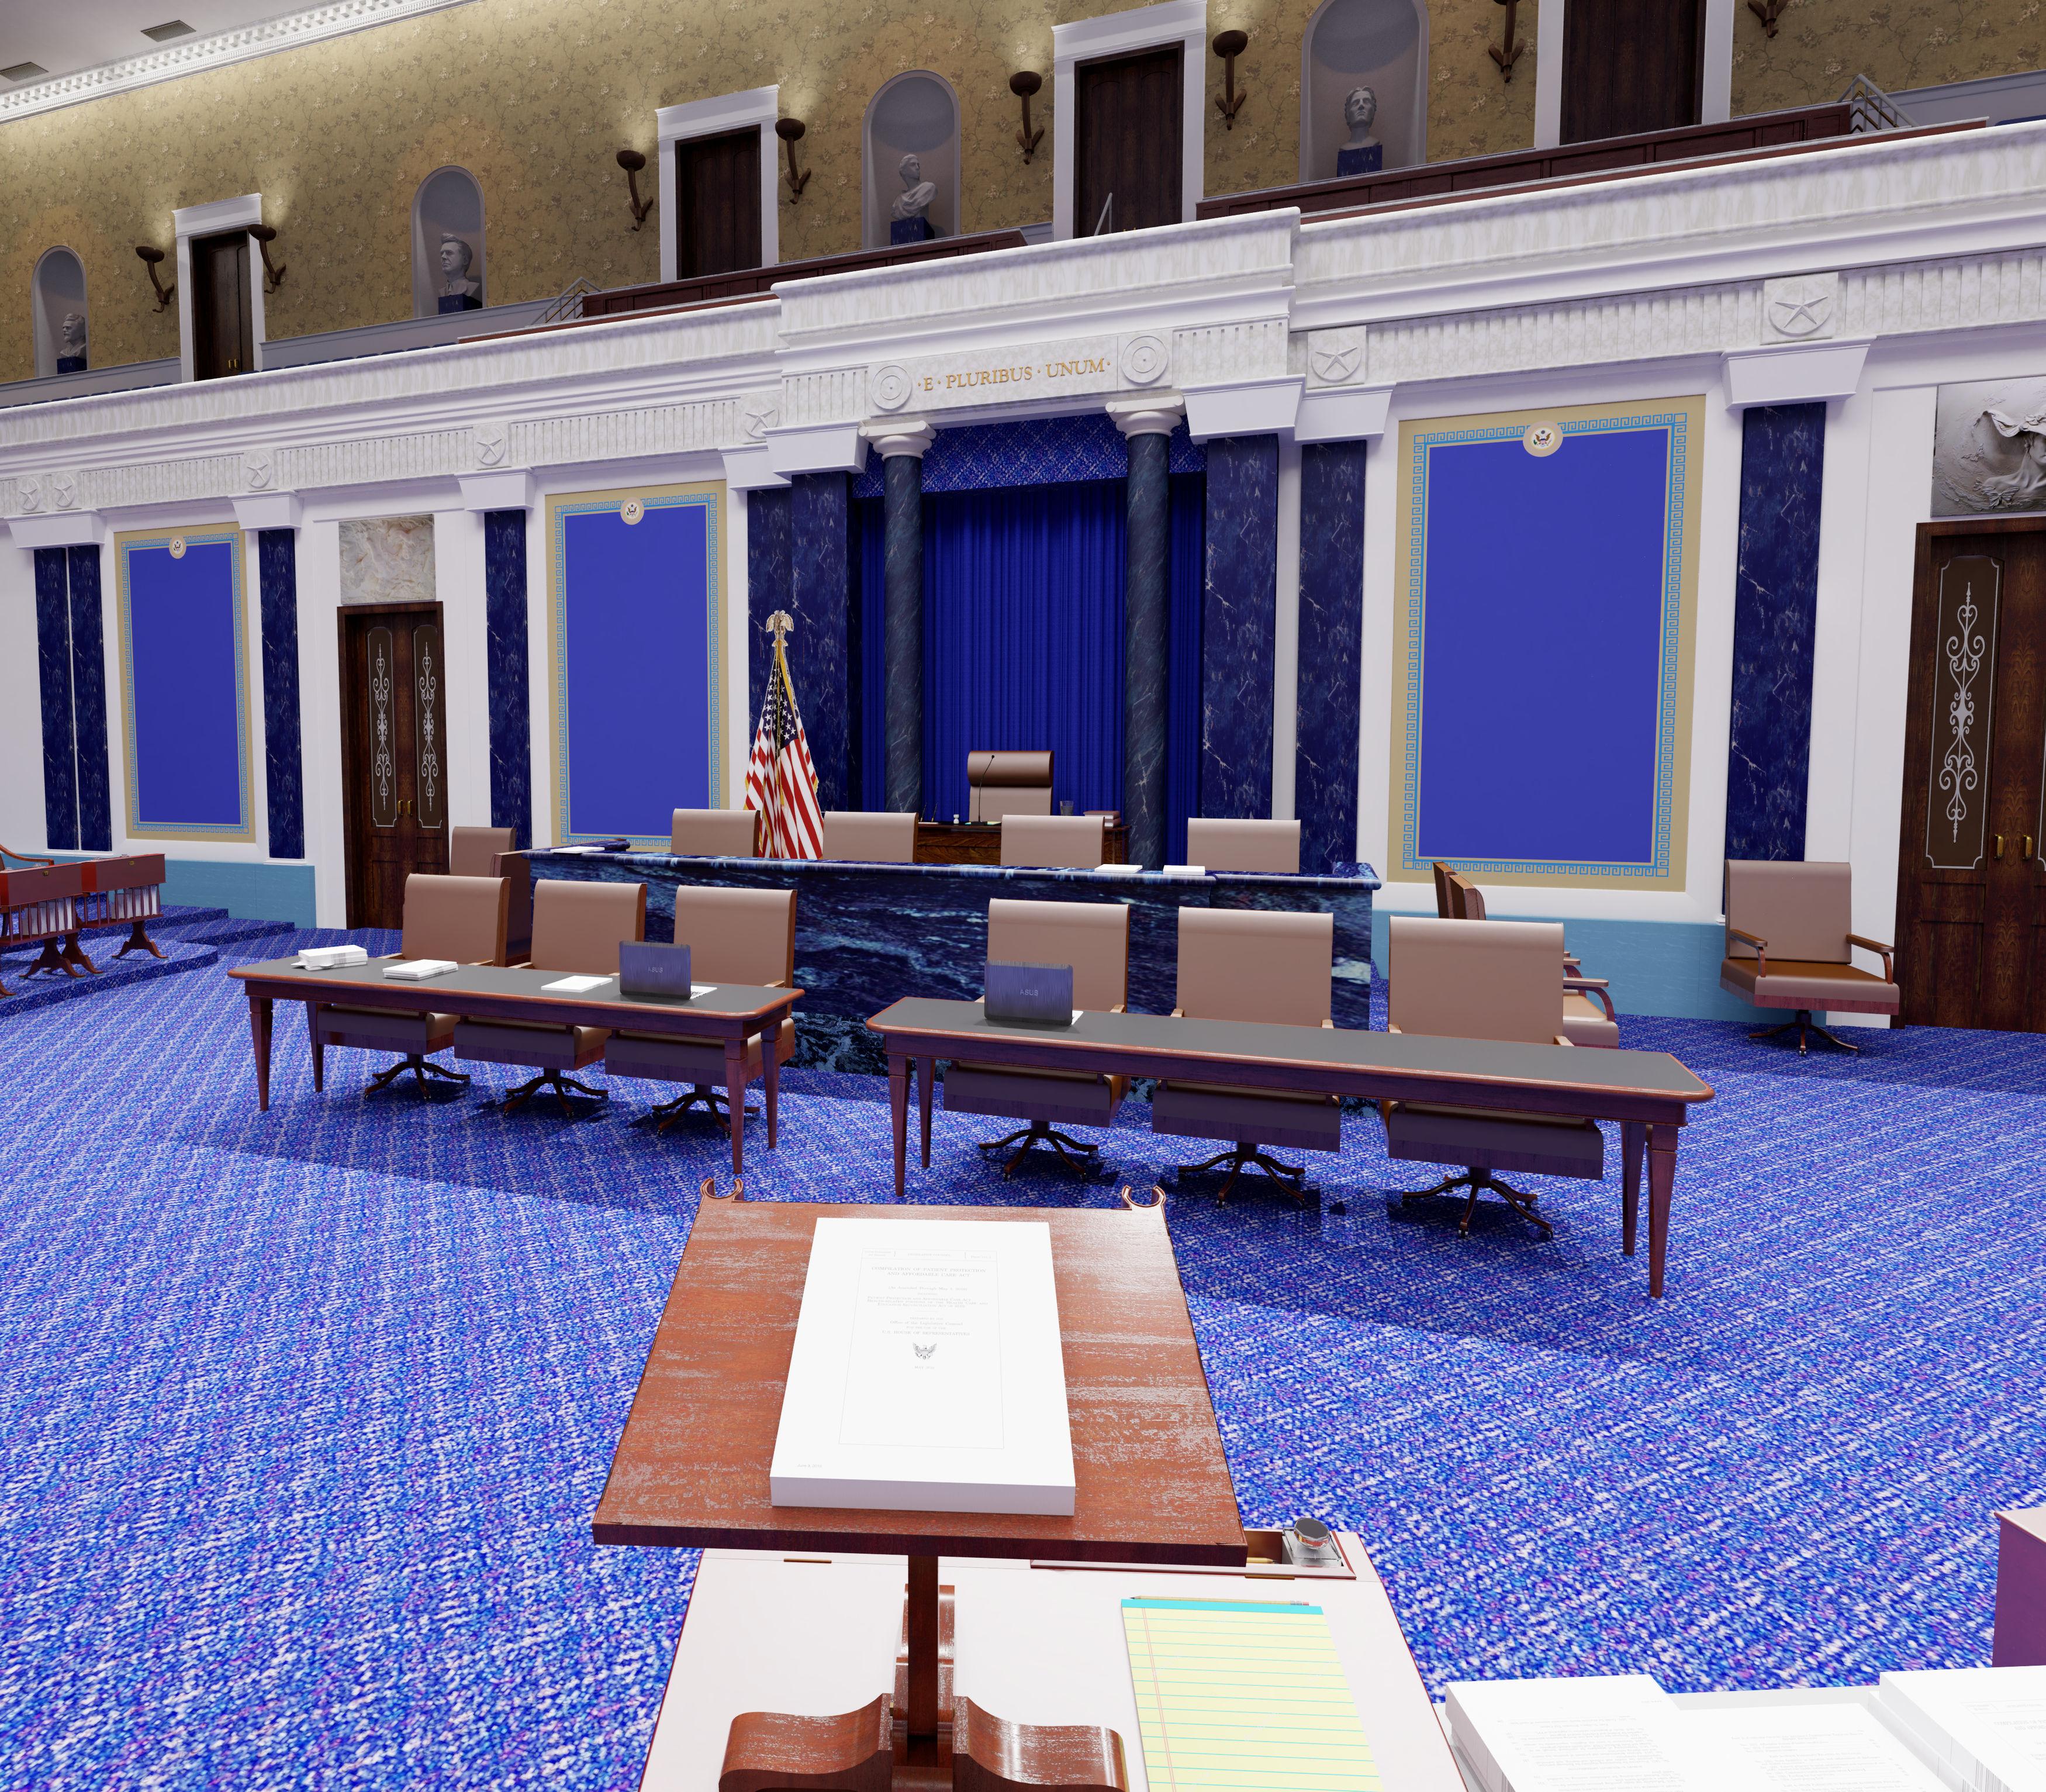 Senate-chamber-tloker-final-rvt-2020-may-07-09-59-14pm-000-majorityleadersview-jpg-3500-3500